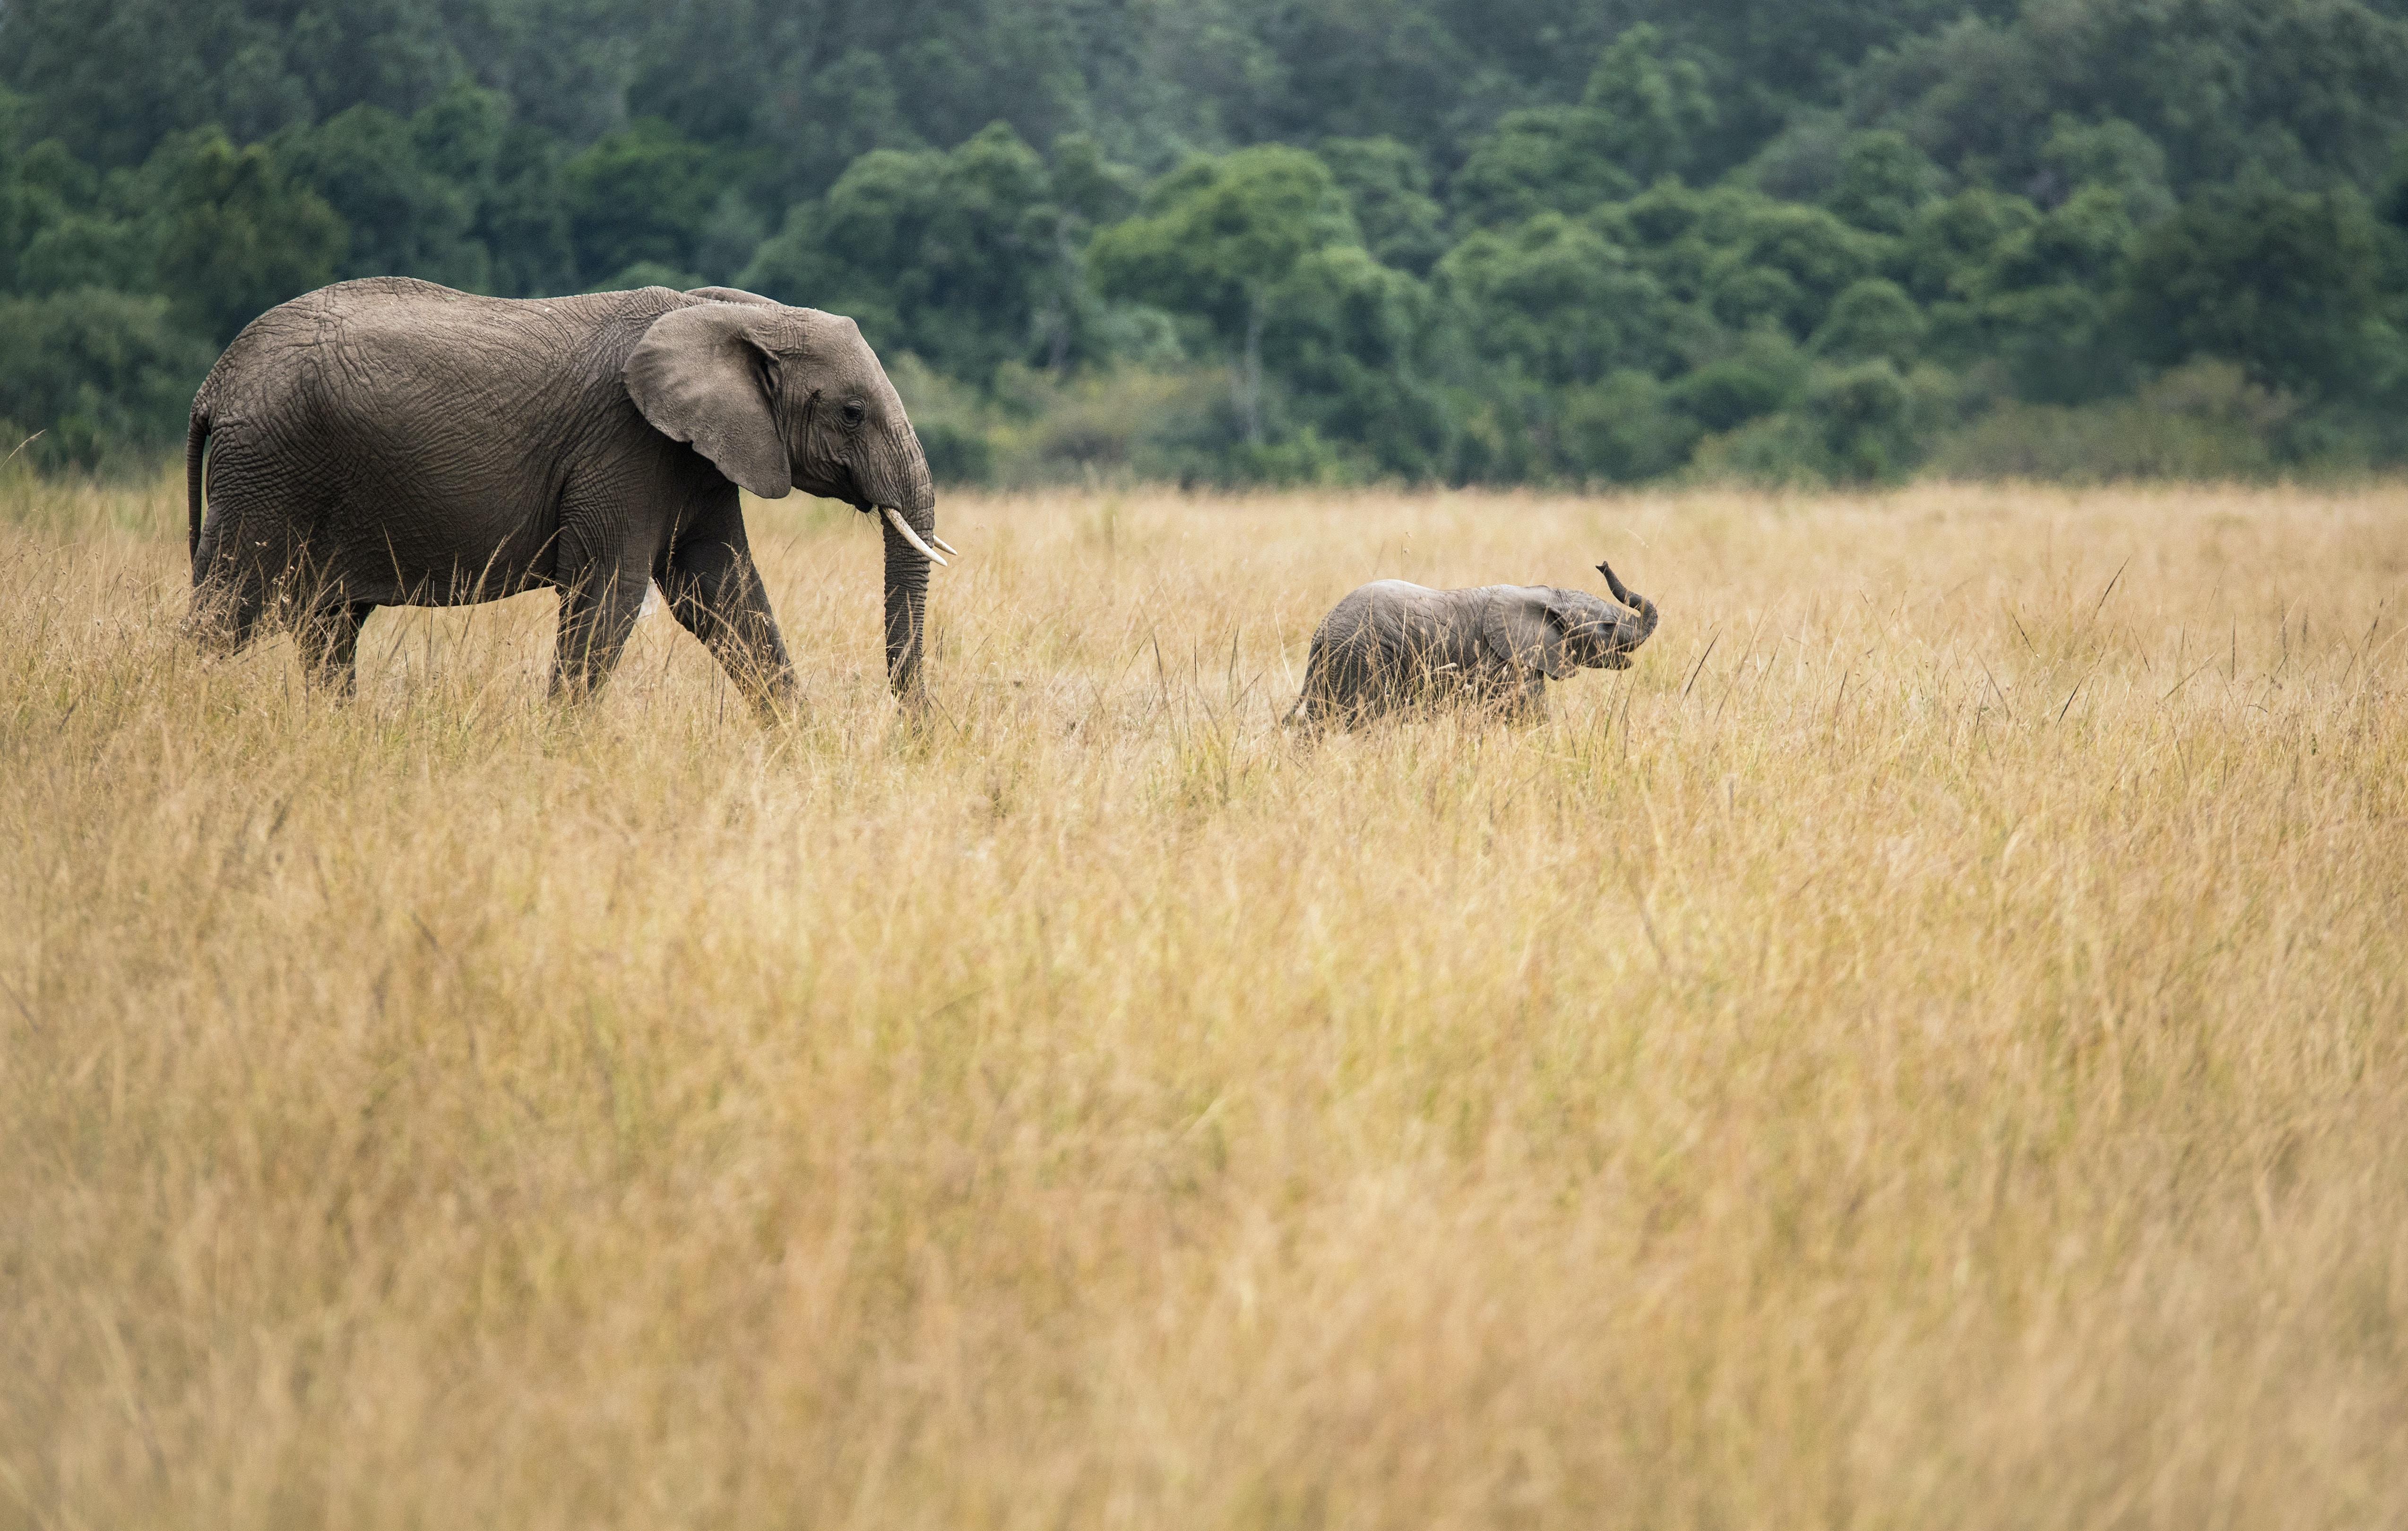 two elephants walking on dried grass field taken during daytime